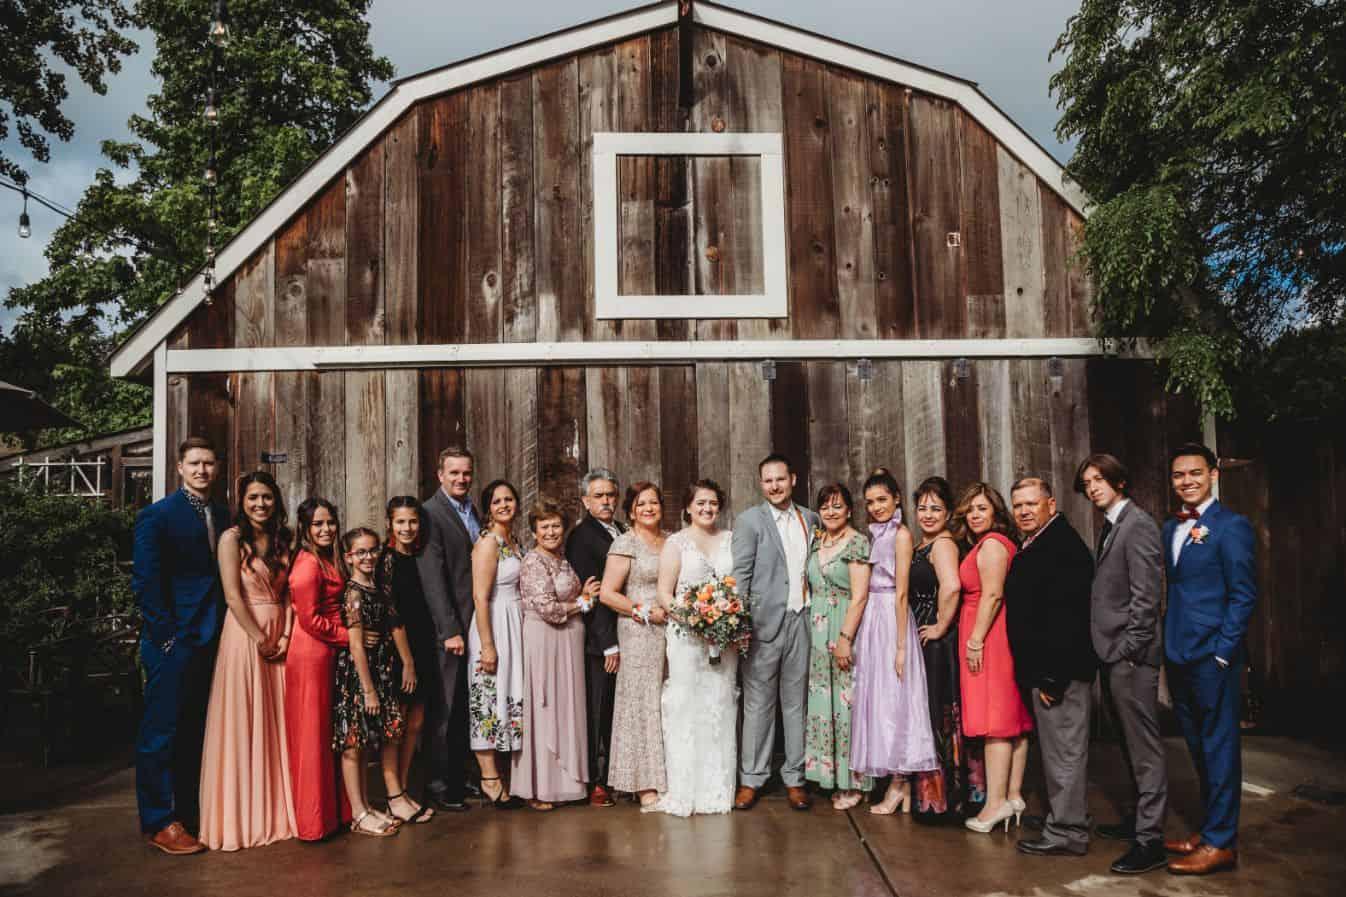 4 photo opportunities rustic mountain house estate weddingi venues northern california